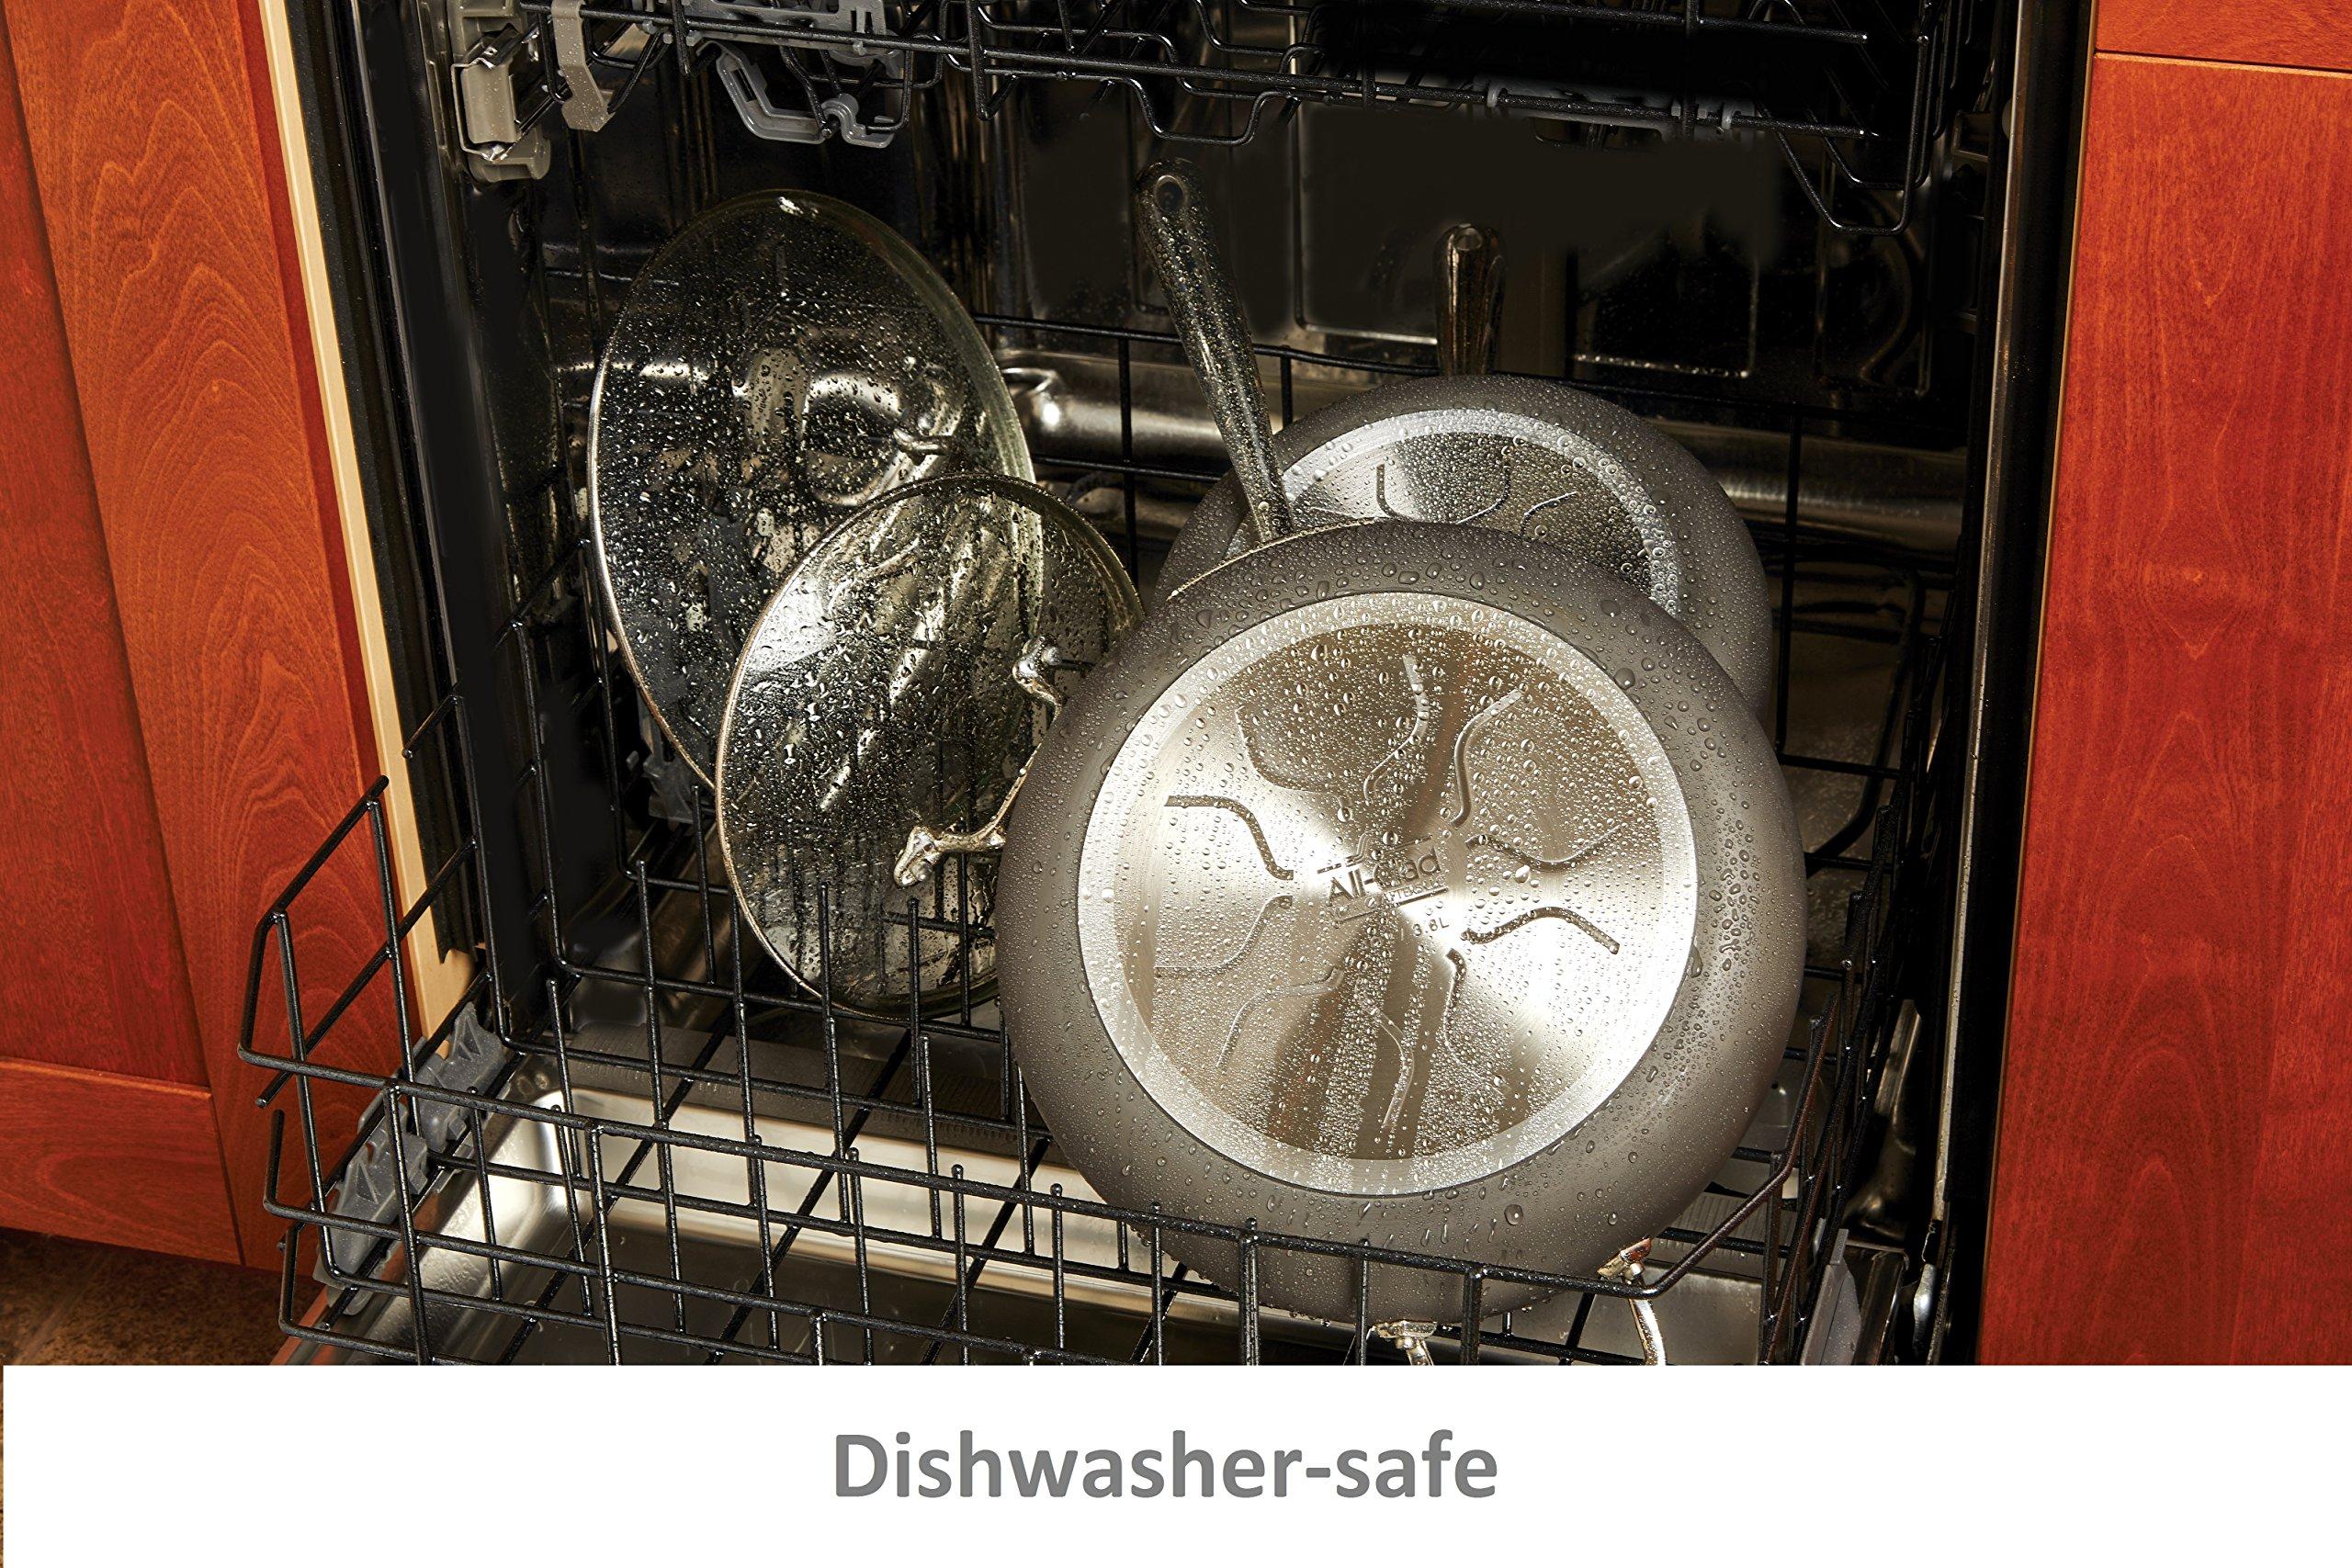 Amf Bz all-clad e7649764 ha1 hard anodized nonstick dishwasher safe pfoa free  roaster cookware, 13-inch16-inch, black